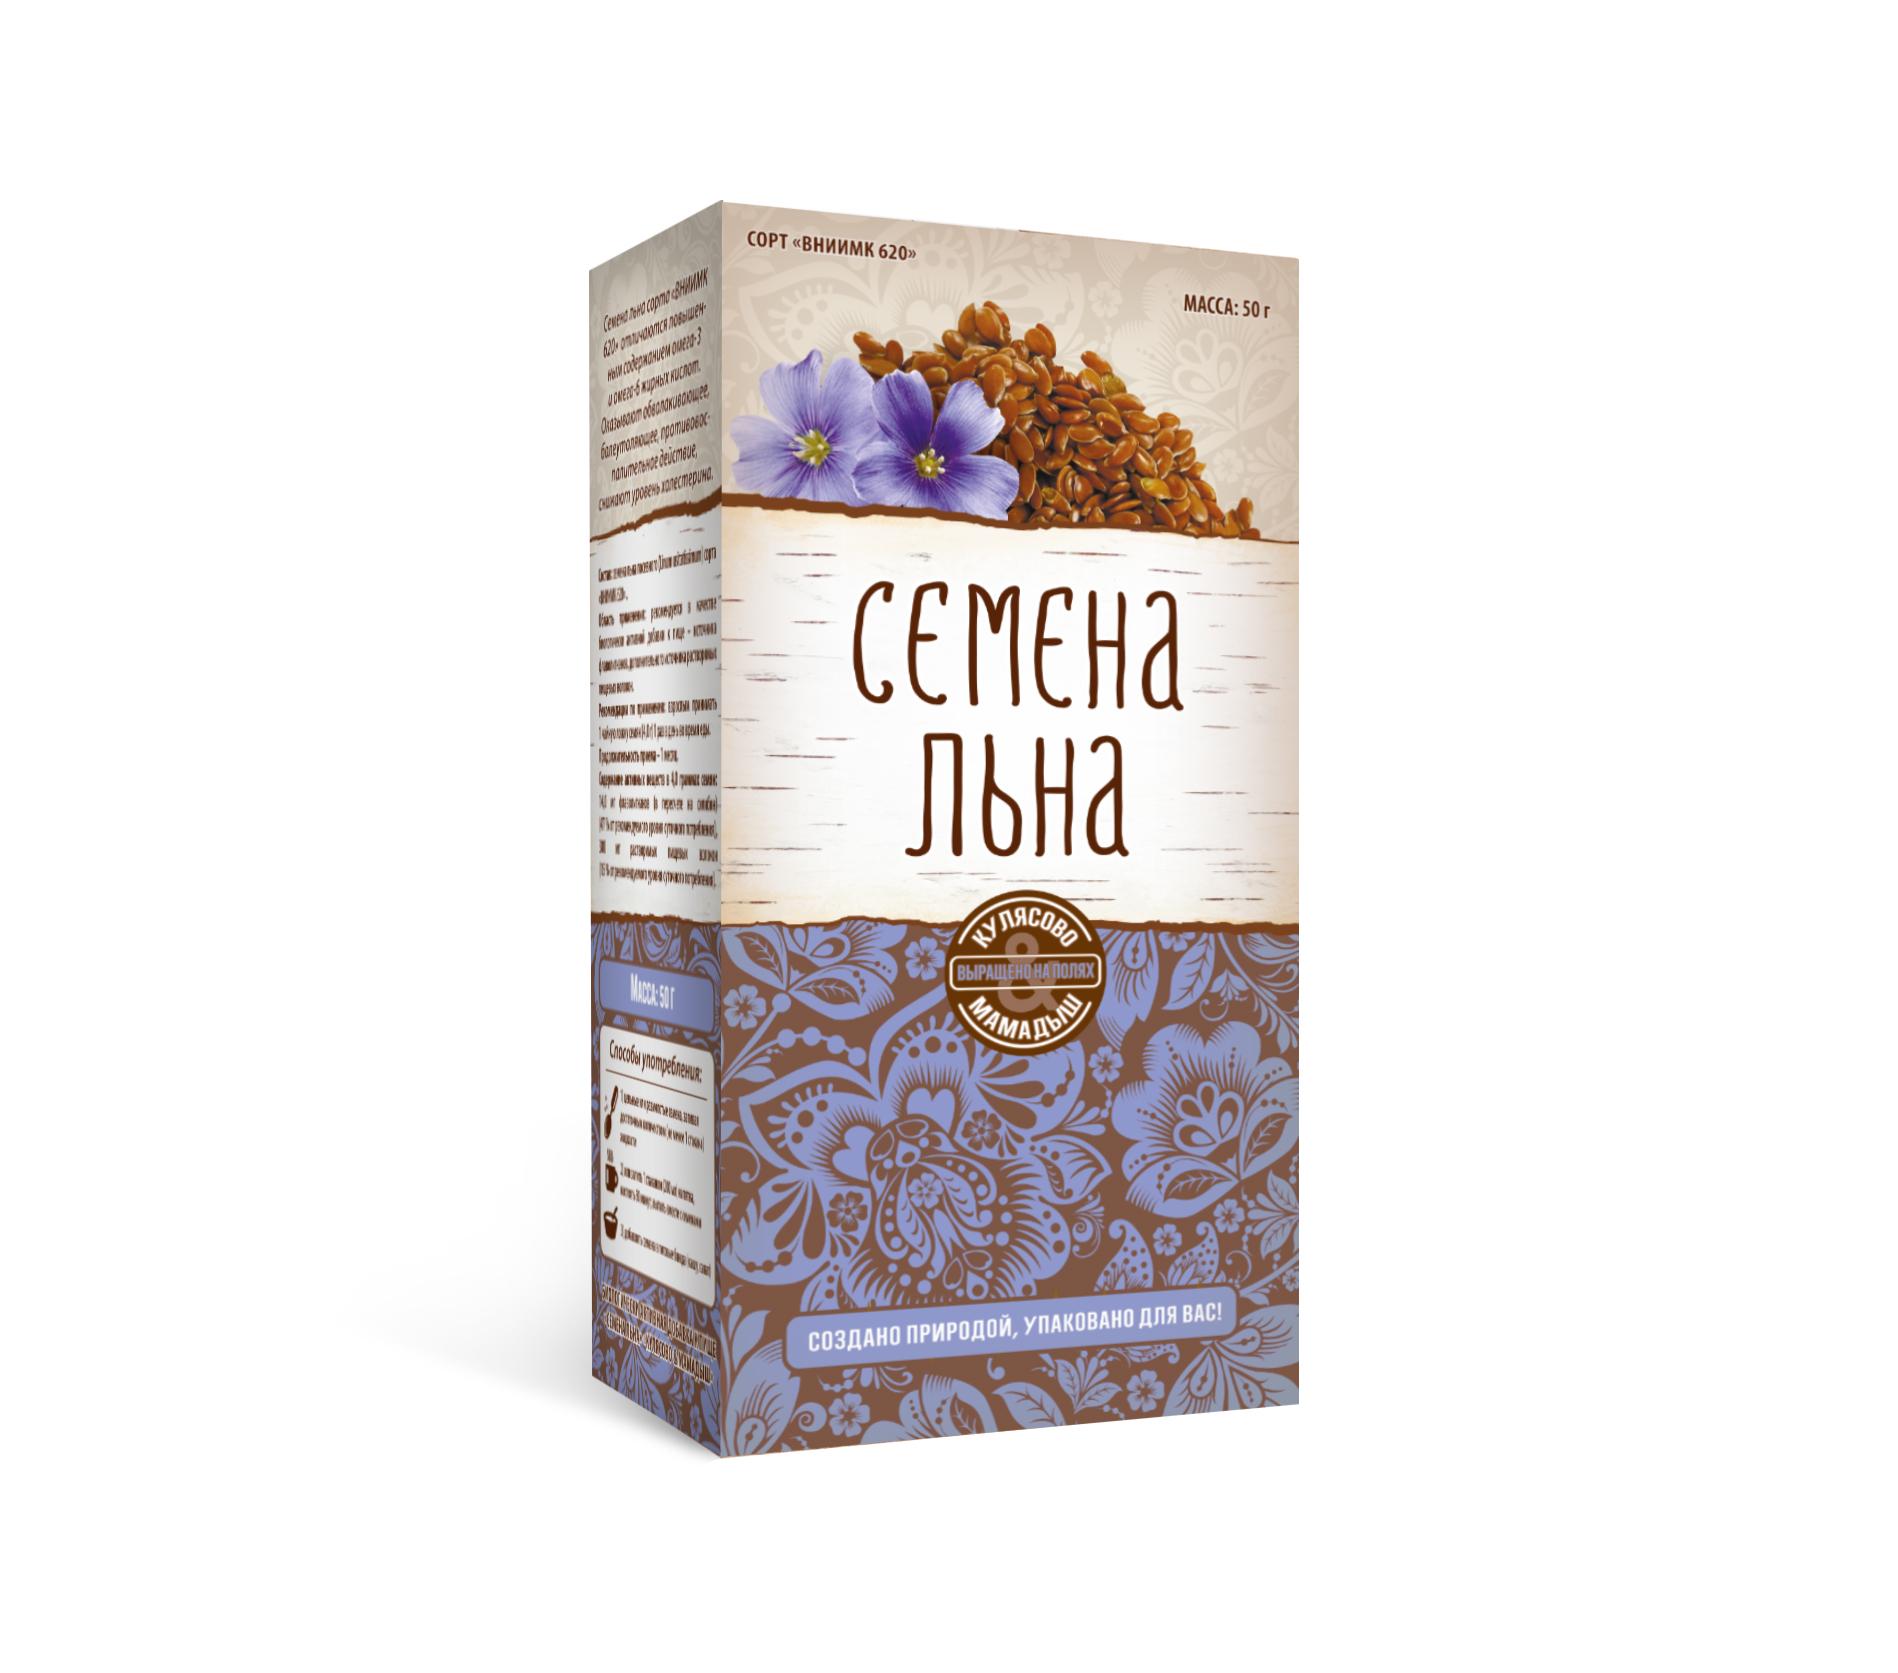 Семена льна. Кулясово & Мамадыш: описание, инструкция по применению